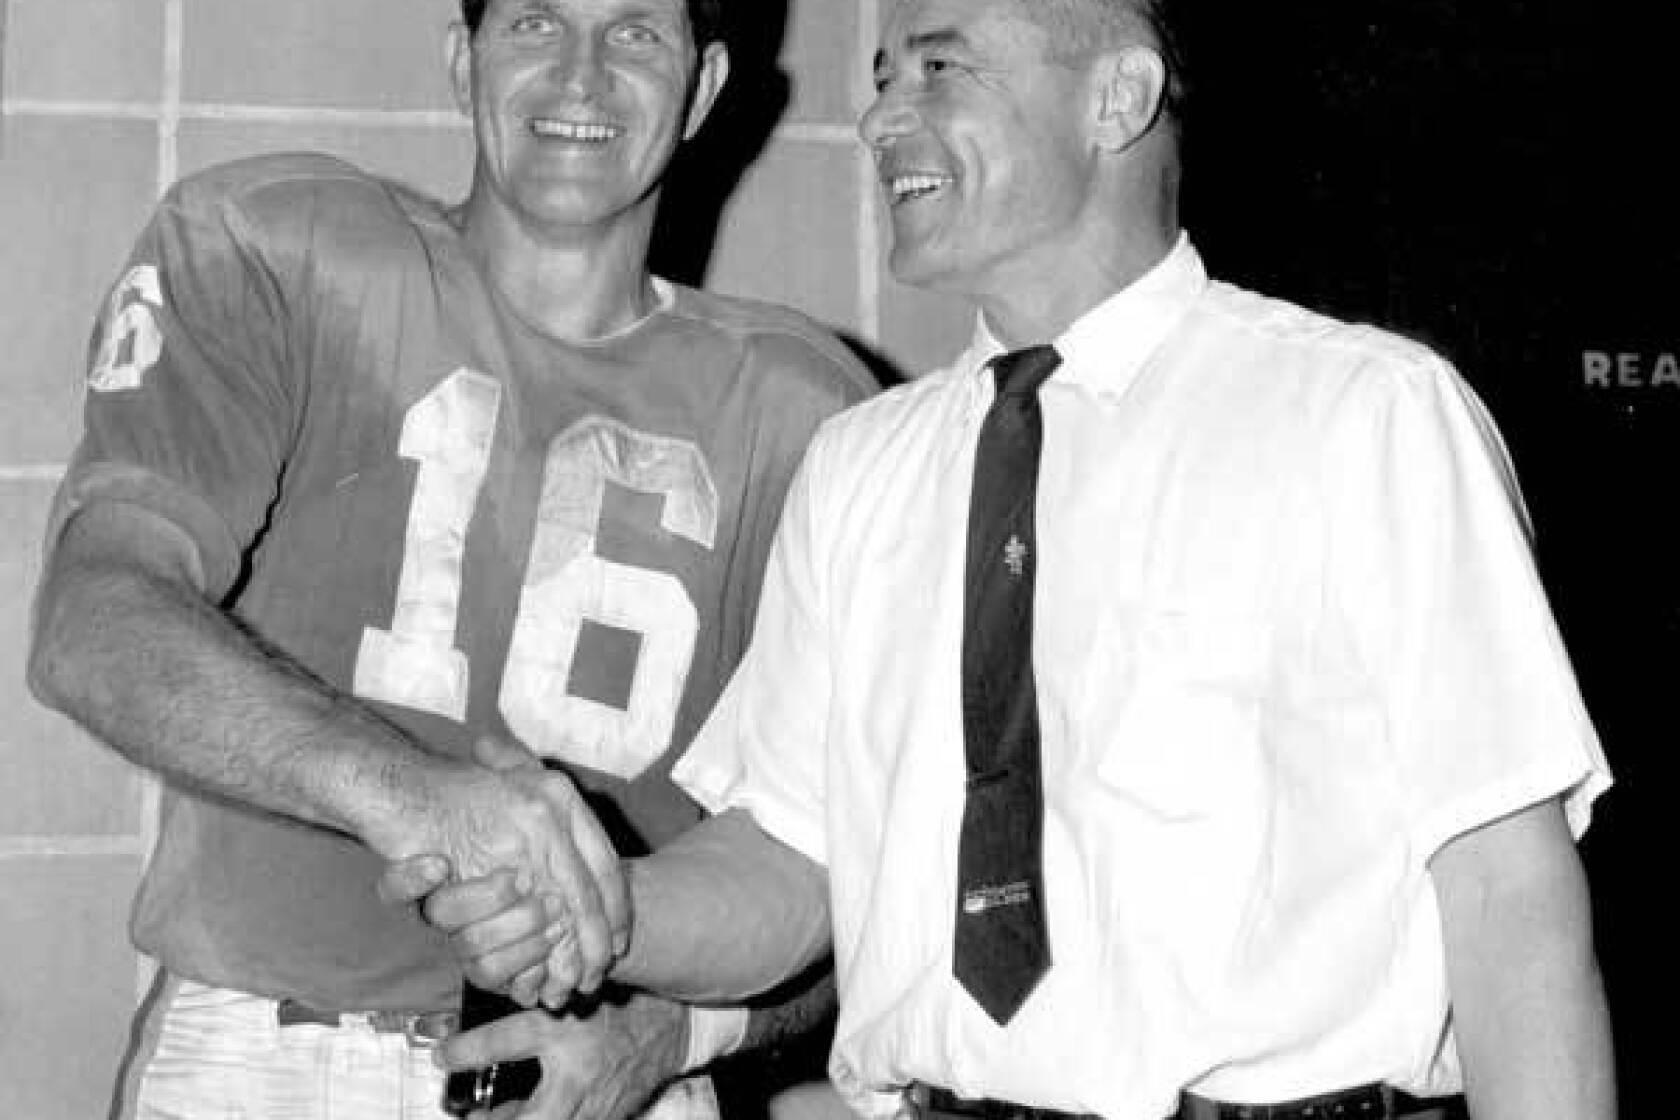 quality design b047a 20d32 Obituary: George Blanda dies at 83; football career spanned ...